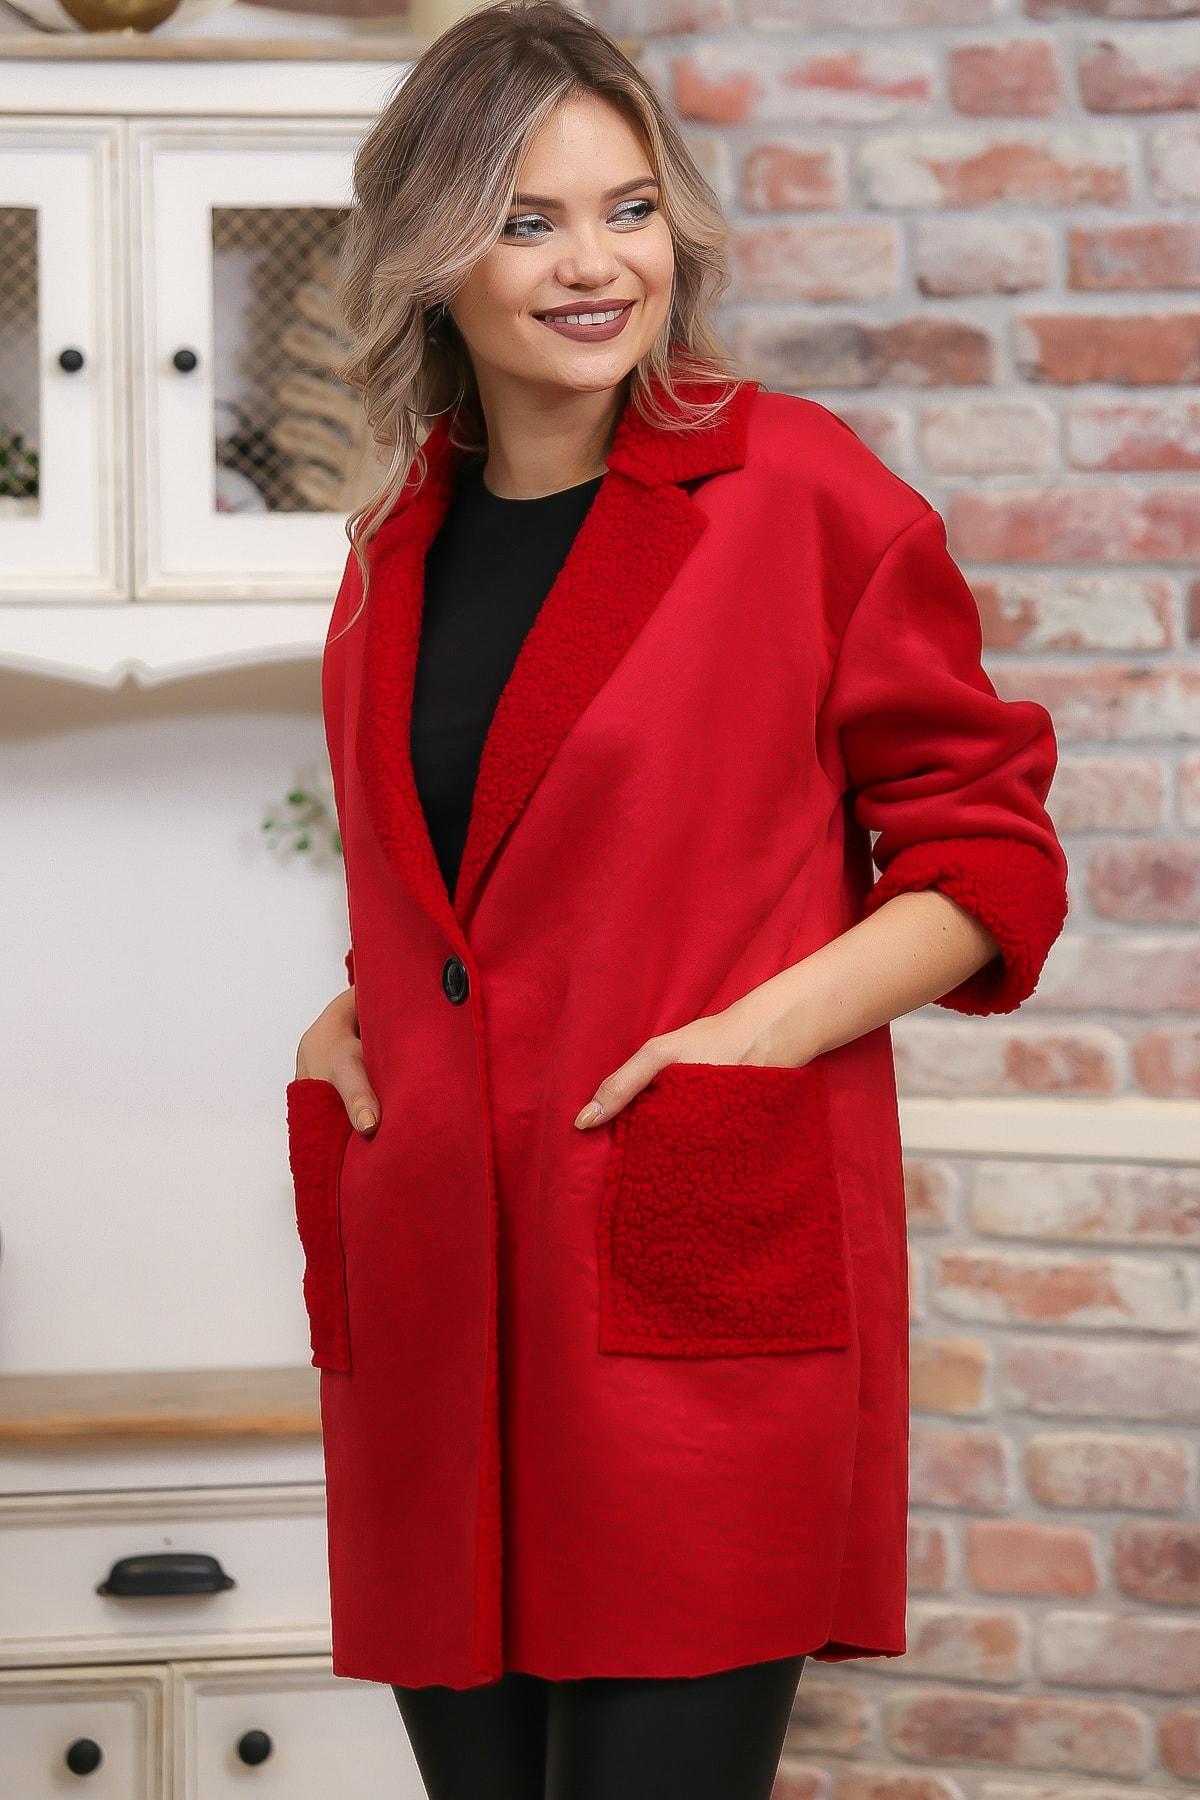 Chiccy Kadın Kırmızı Teddy Peluş Astarlı Cepli Düğme Detaylı Retro Kaban M10210200KA99802